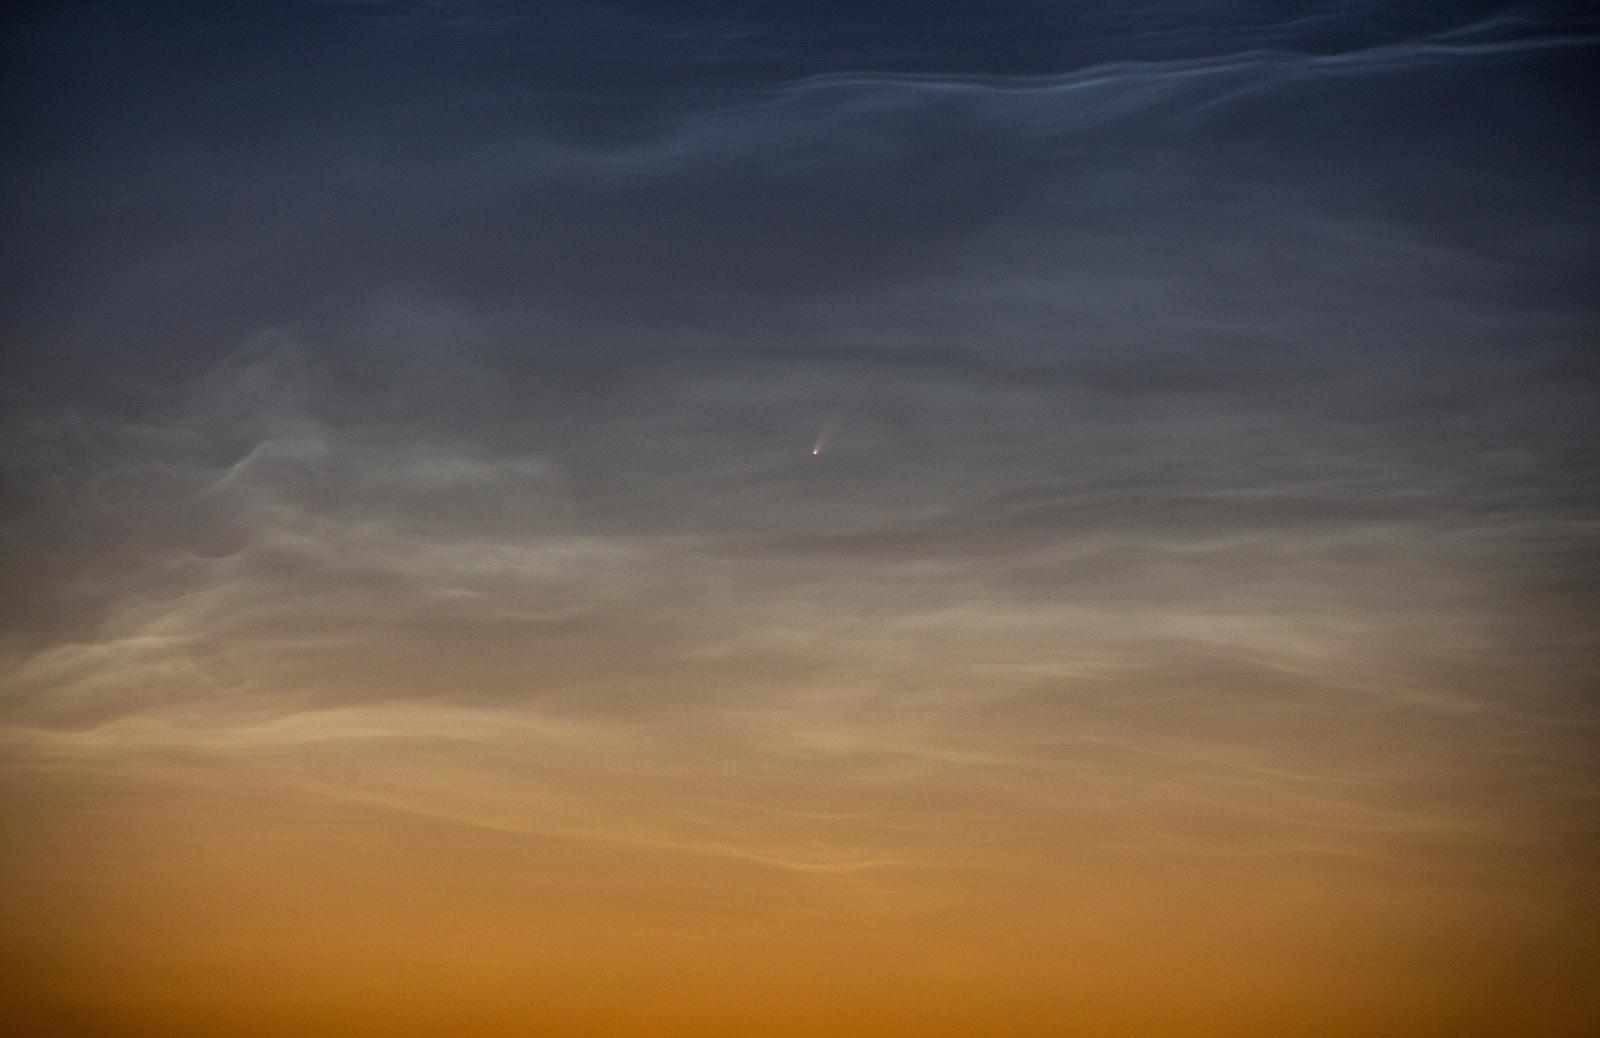 kometa_06_07_2020.jpg